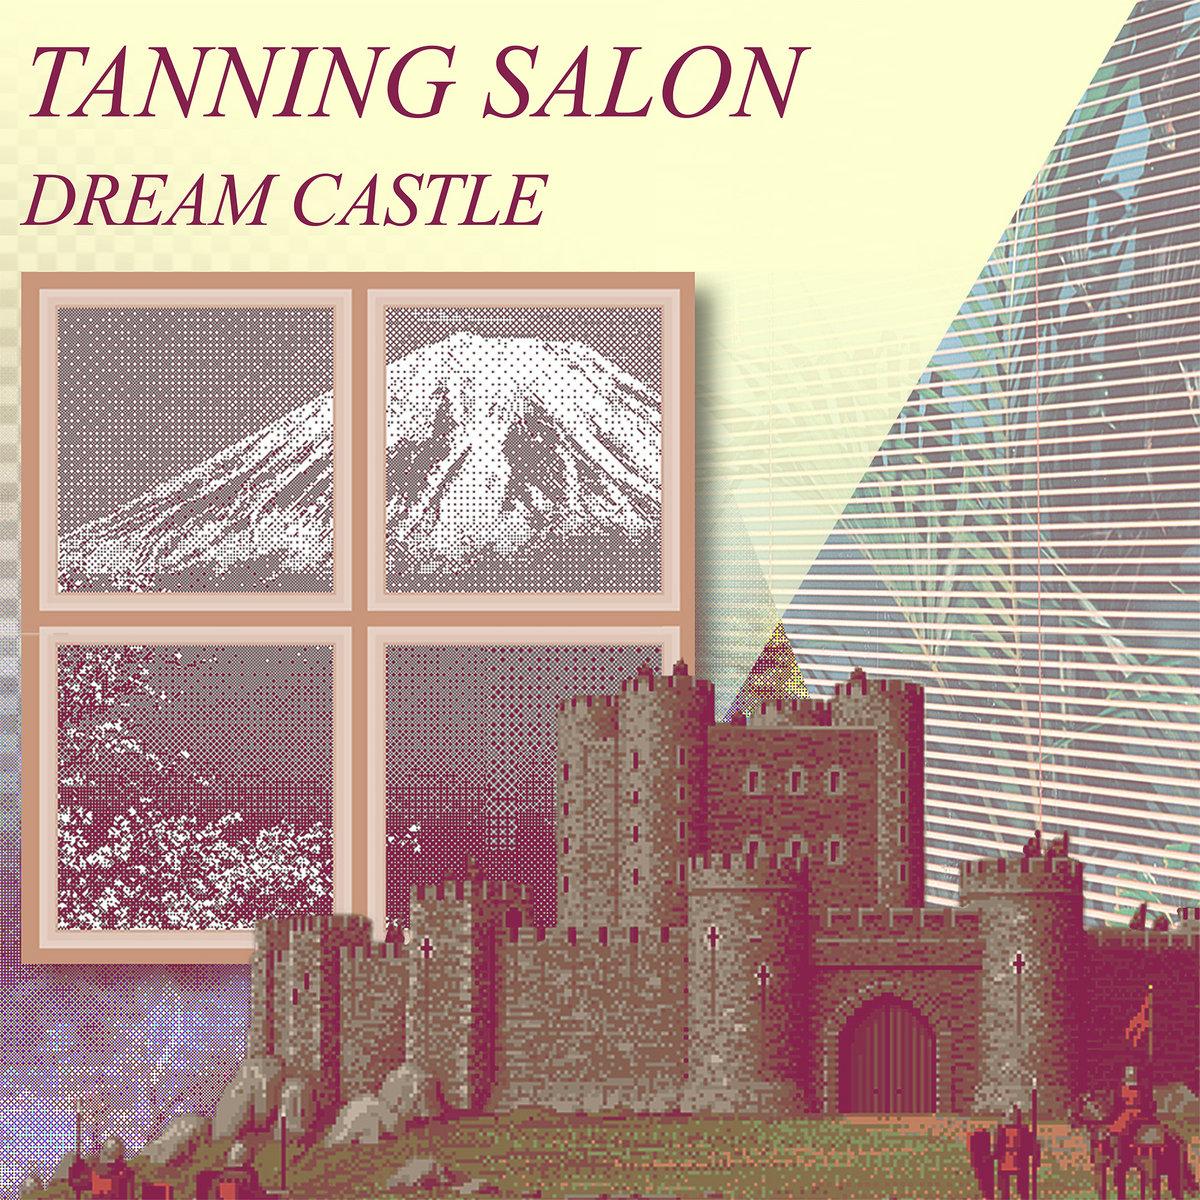 dream castle | olde english spelling bee